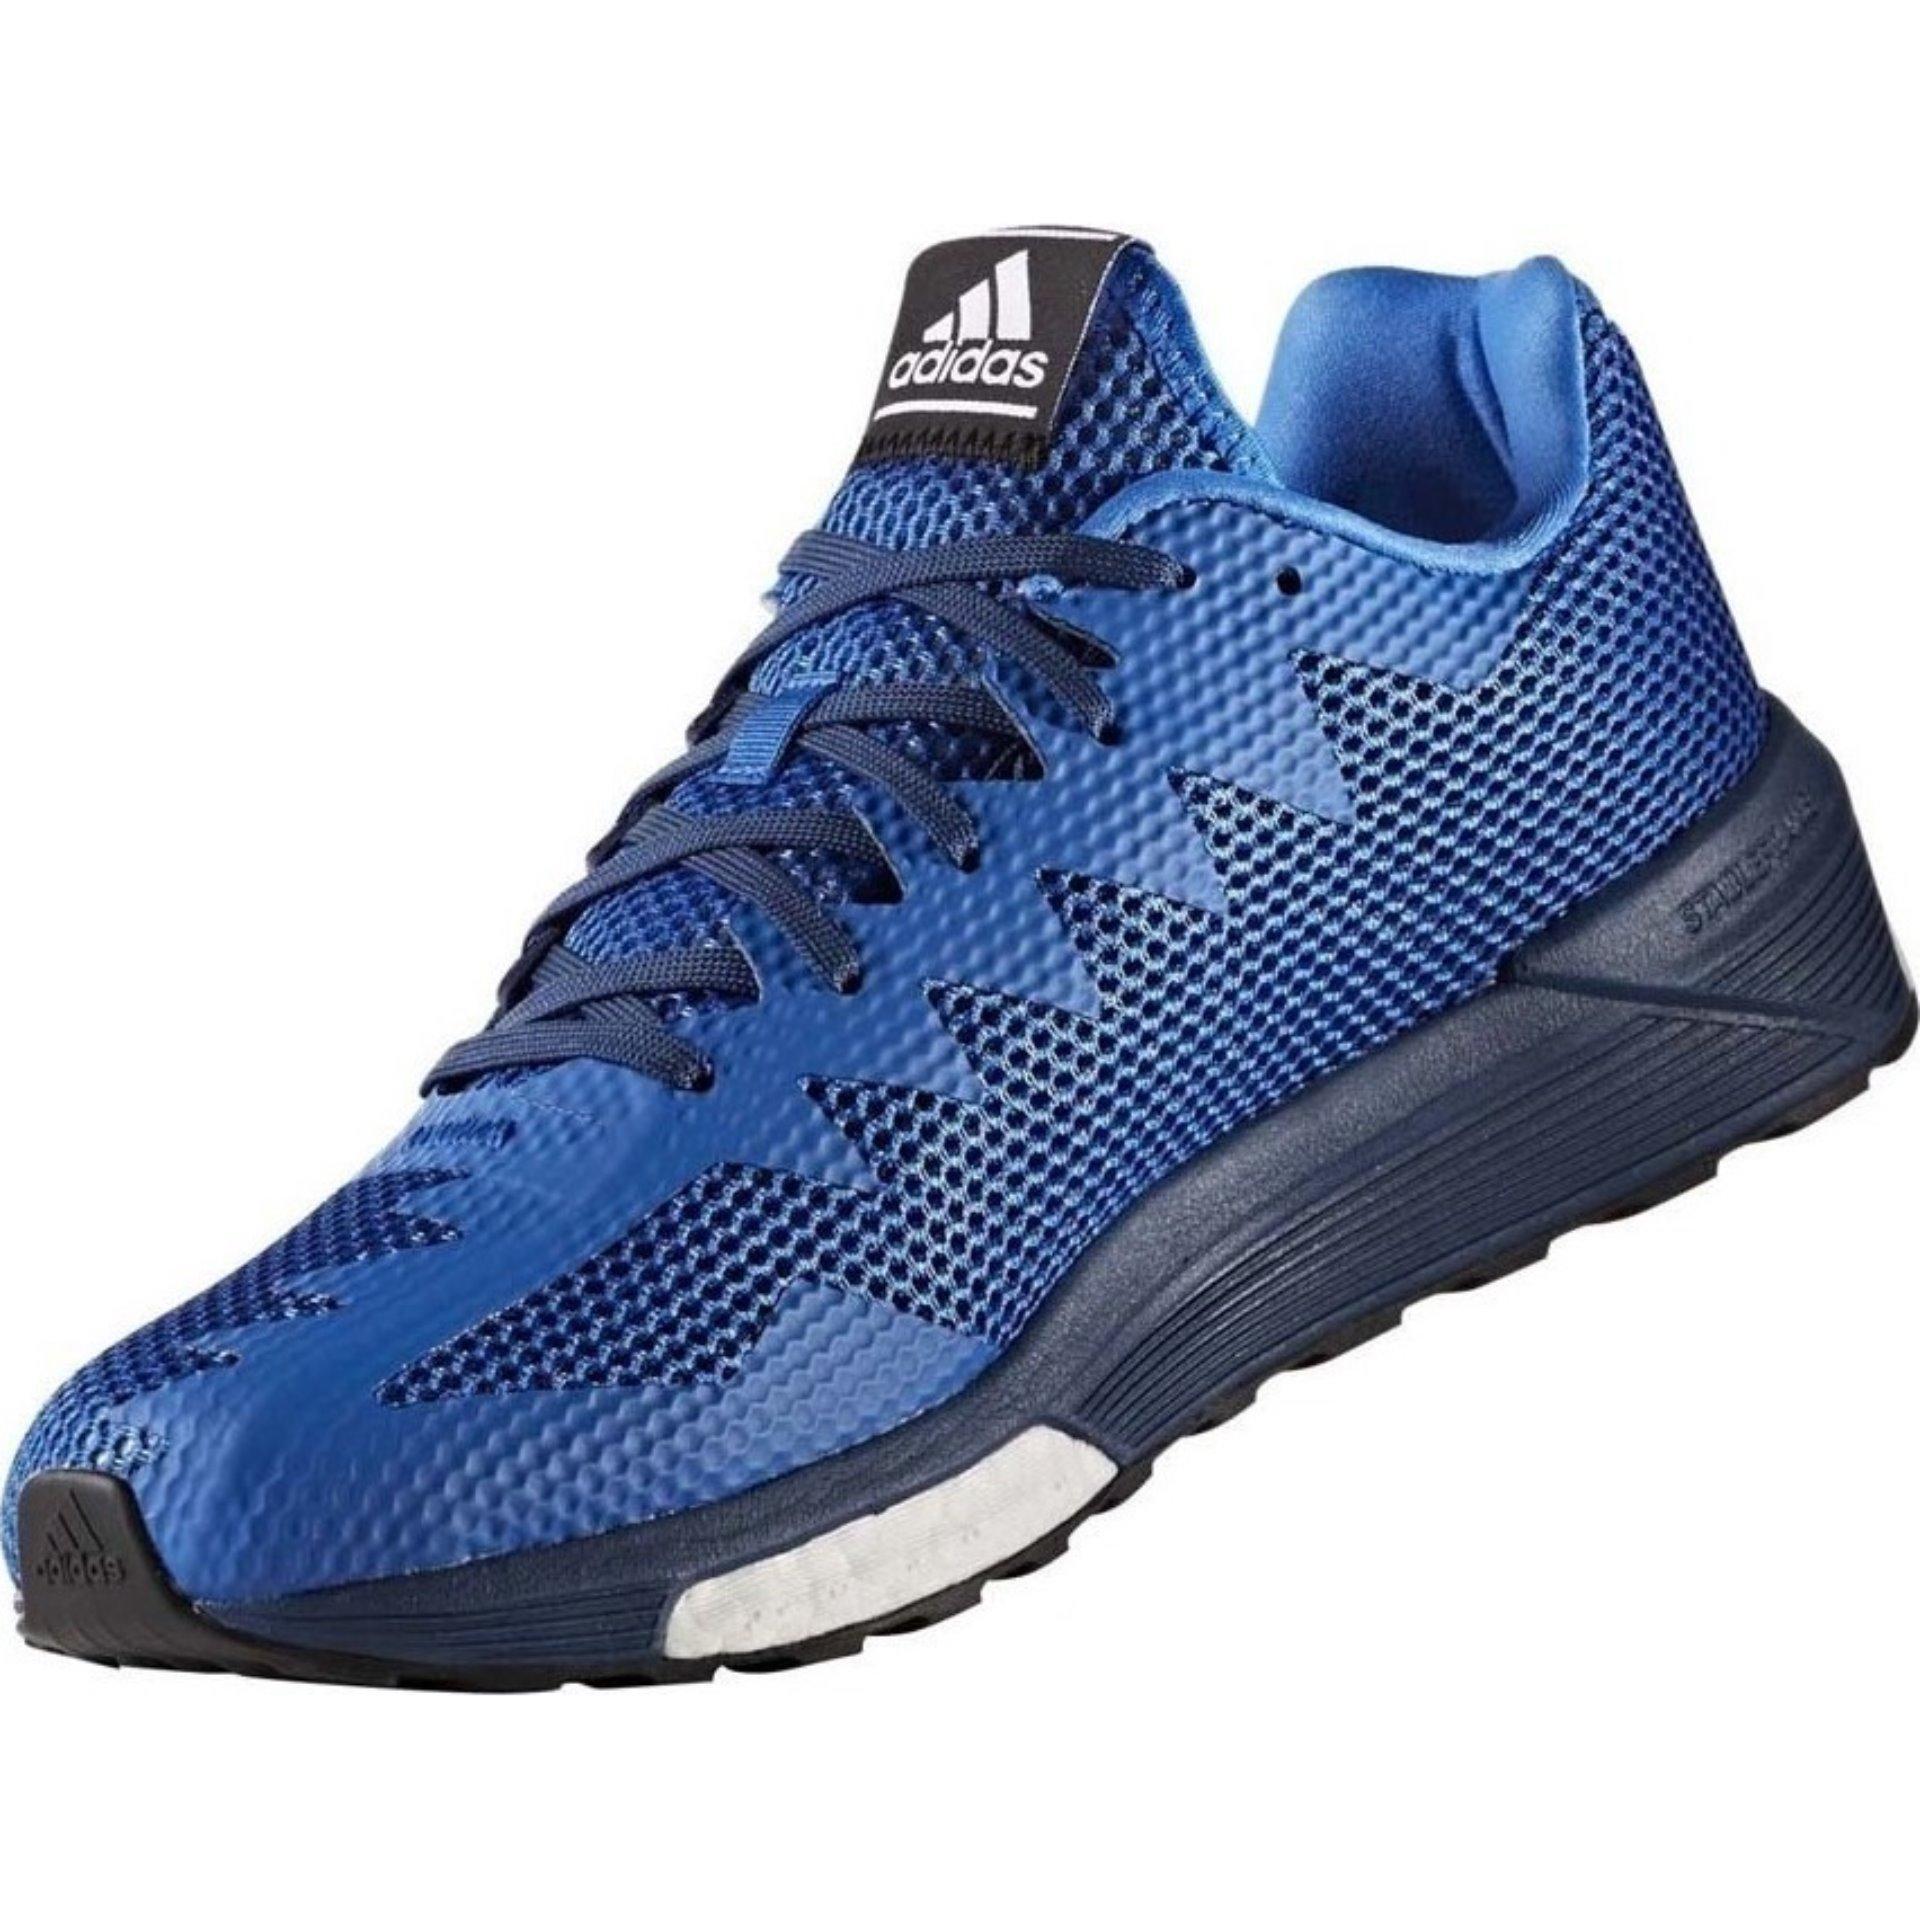 Adidas Sepatu Running Adineo Cloudfoam Speed Aw4910 Biru - Review ... f3b380bb64